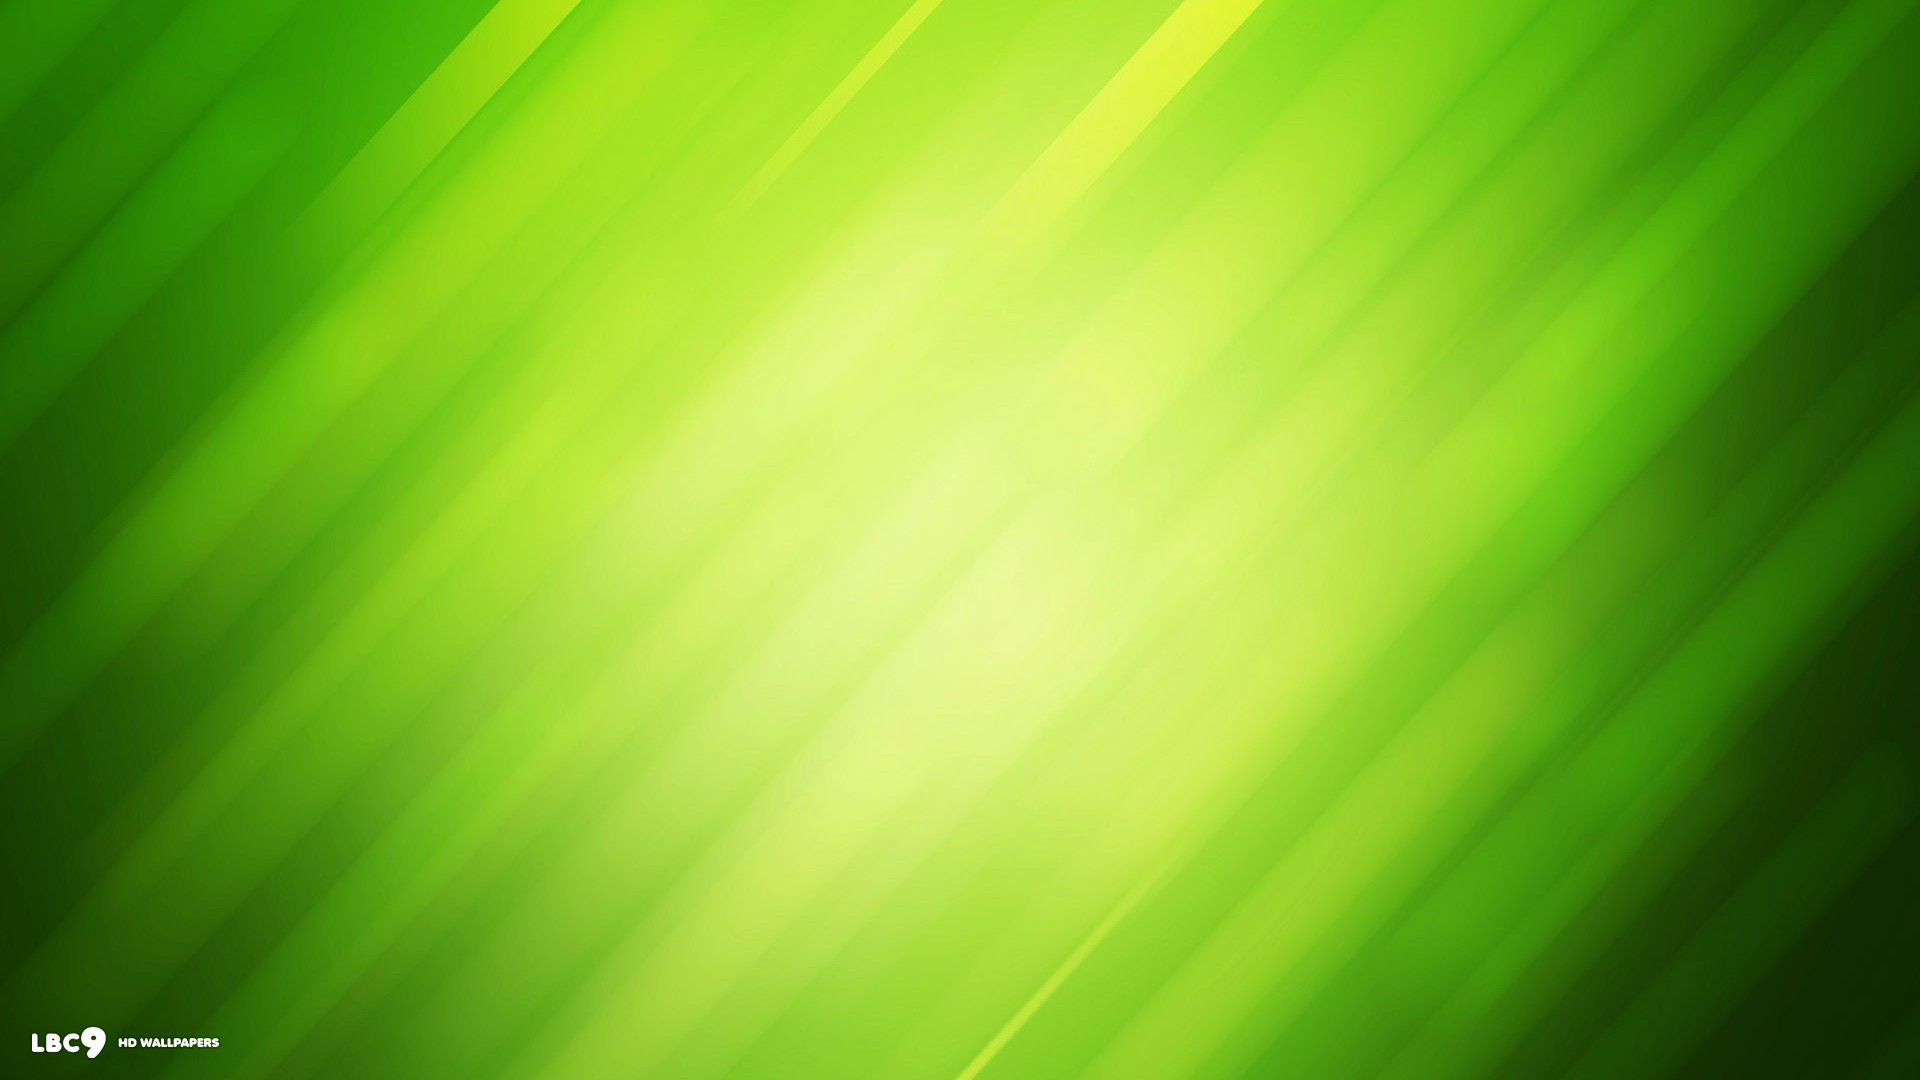 Res: 1920x1080, green abstract hd wallpaper 1080p